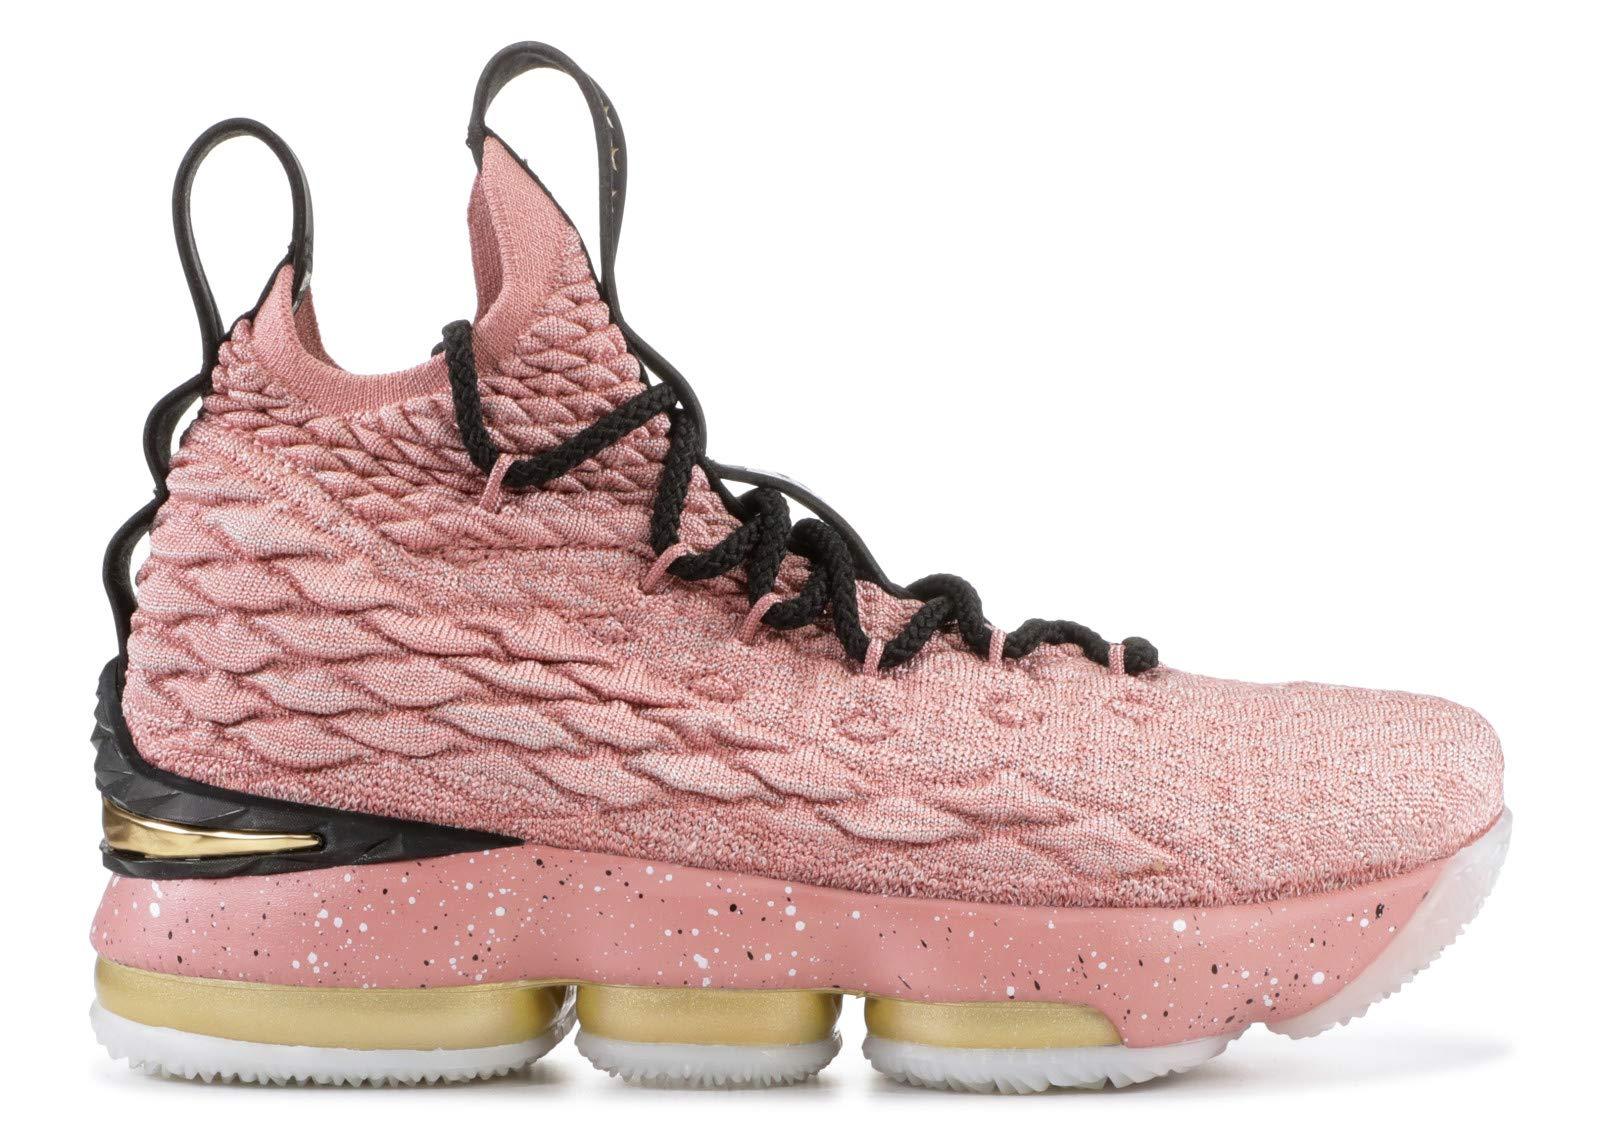 Nike Kid's Lebron XV LMTD GS, Rust Pink